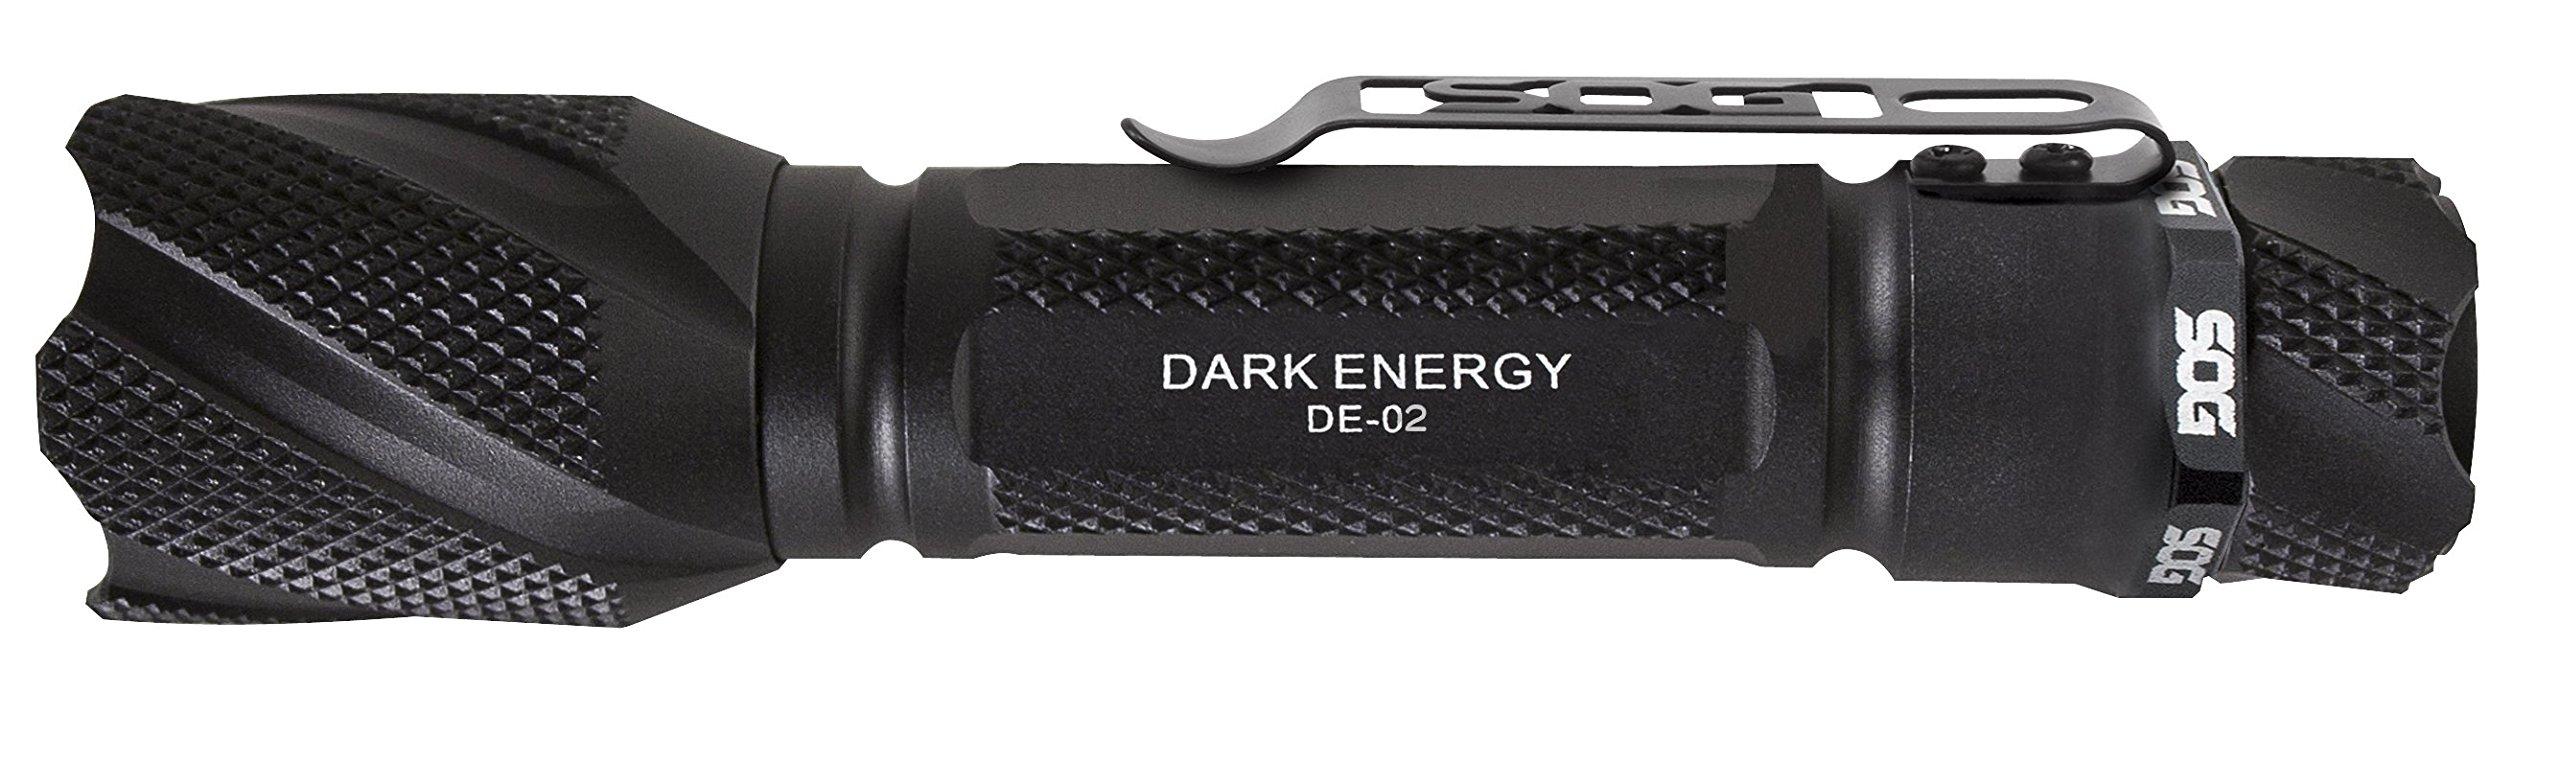 SOG Dark Energy Flashlight DE-02-263 Lumens, Two CR-123A, Annodized Aluminum Body, CREE LED Technology